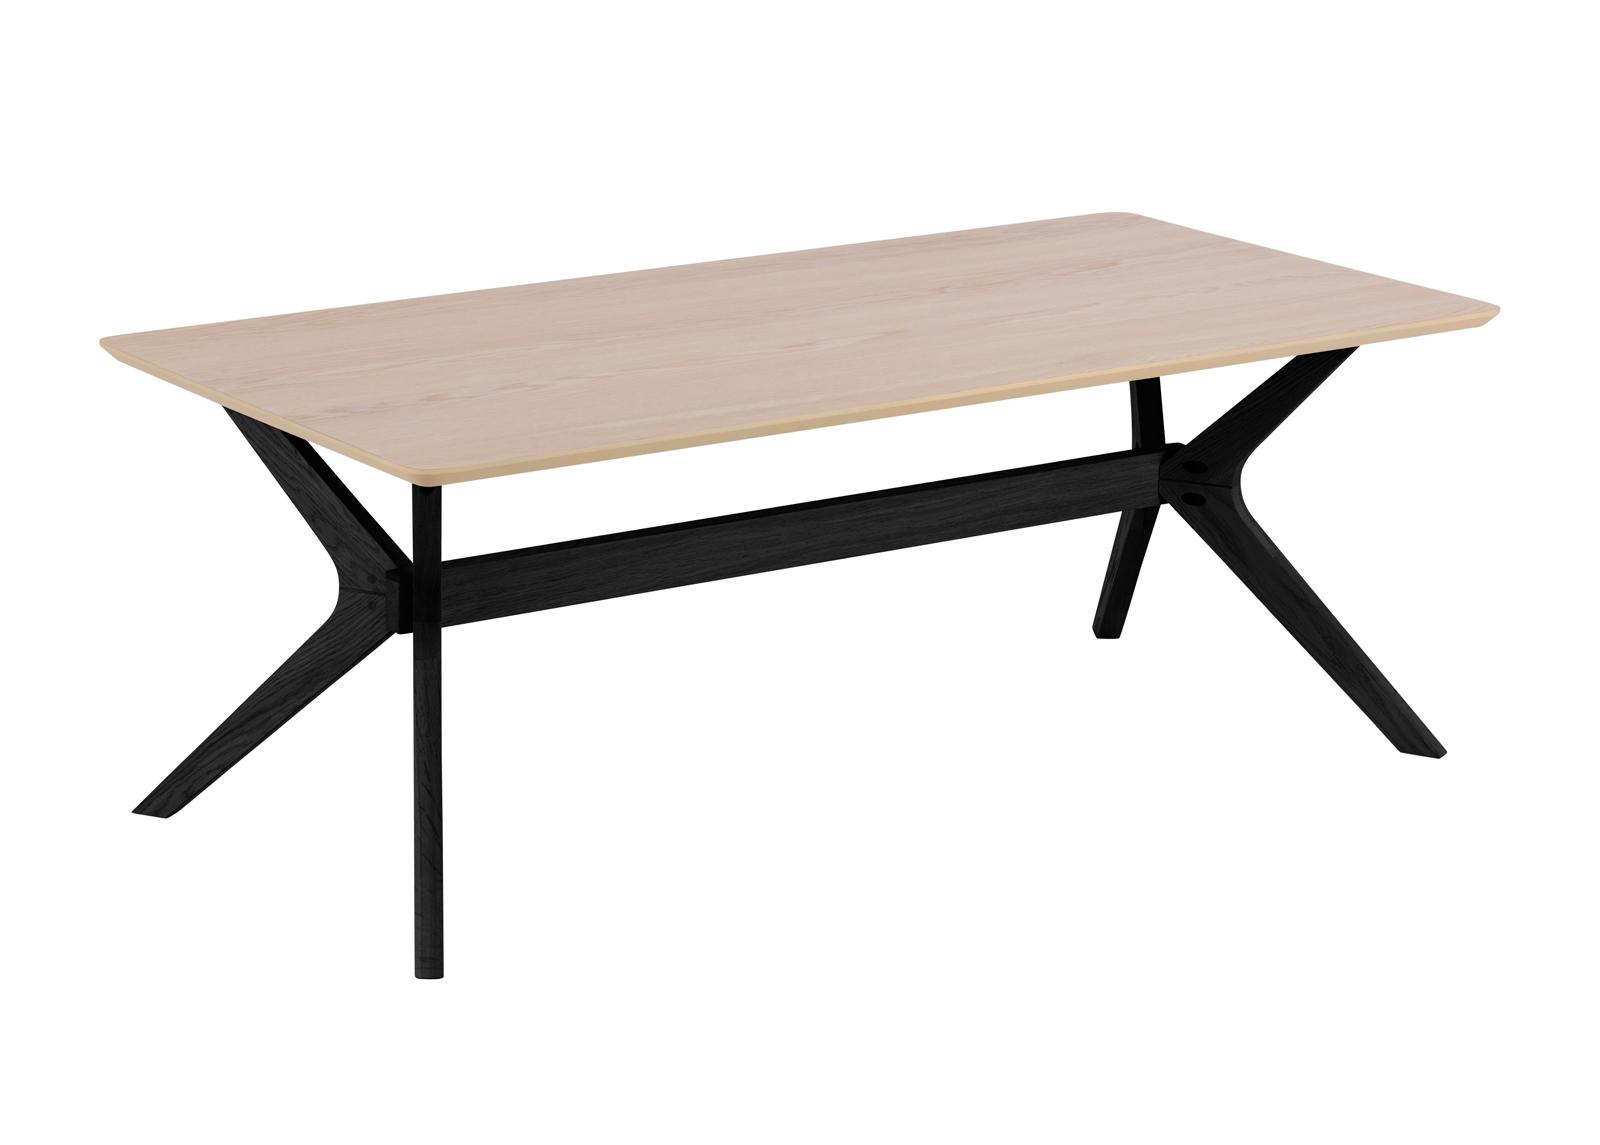 Sohvapöytä Duncan 120x60 cm